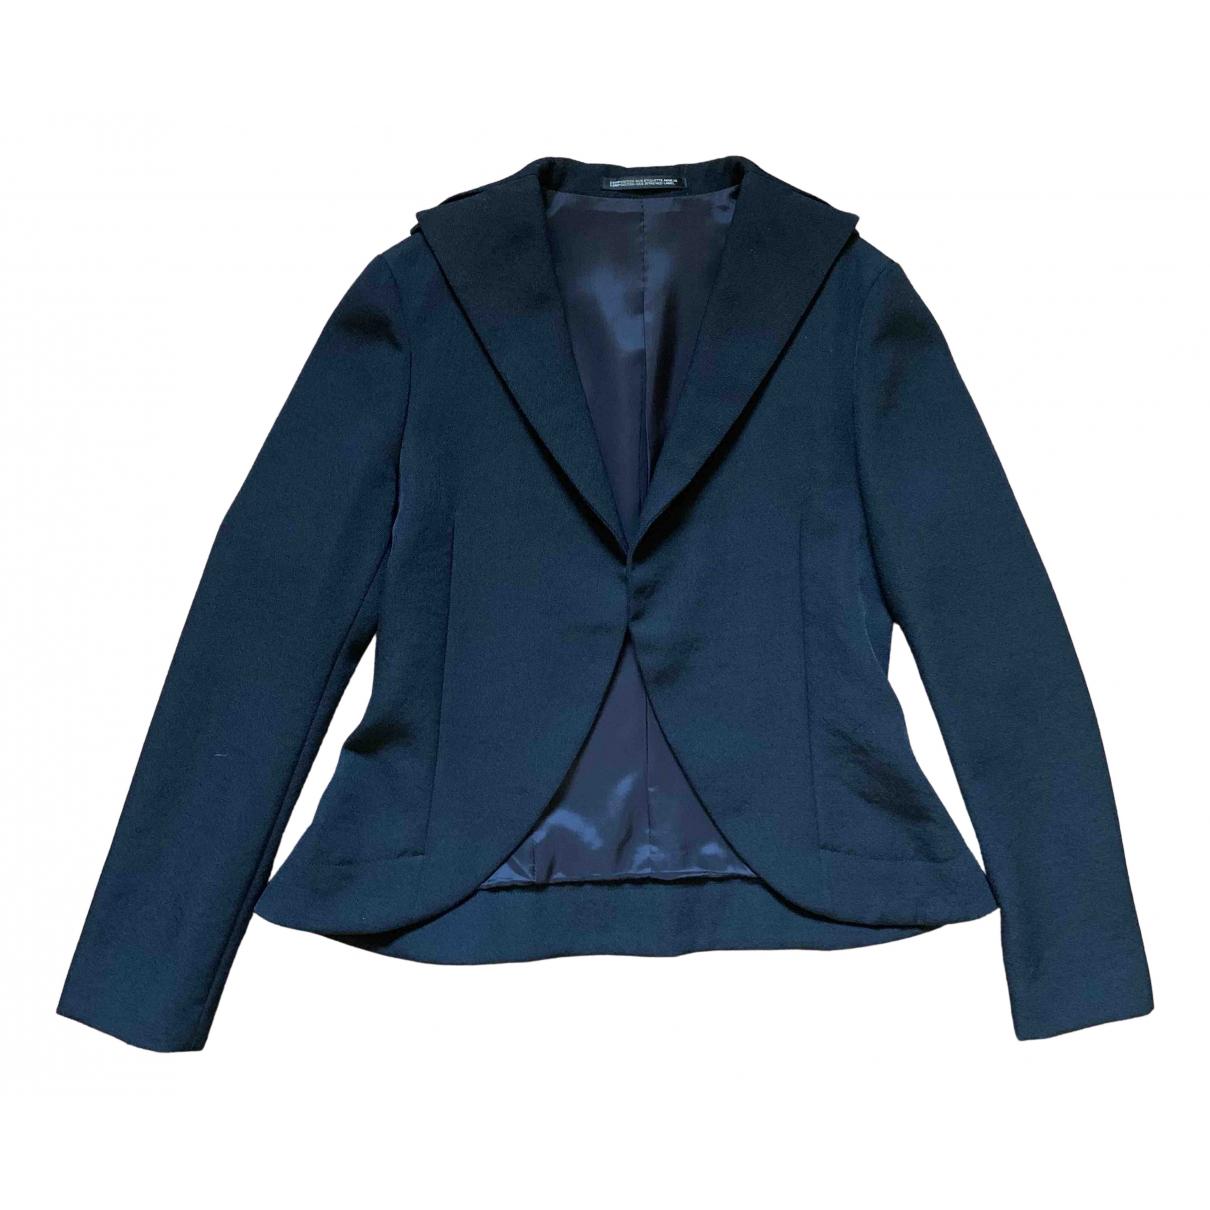 Yohji Yamamoto \N Black Wool jacket for Women S International